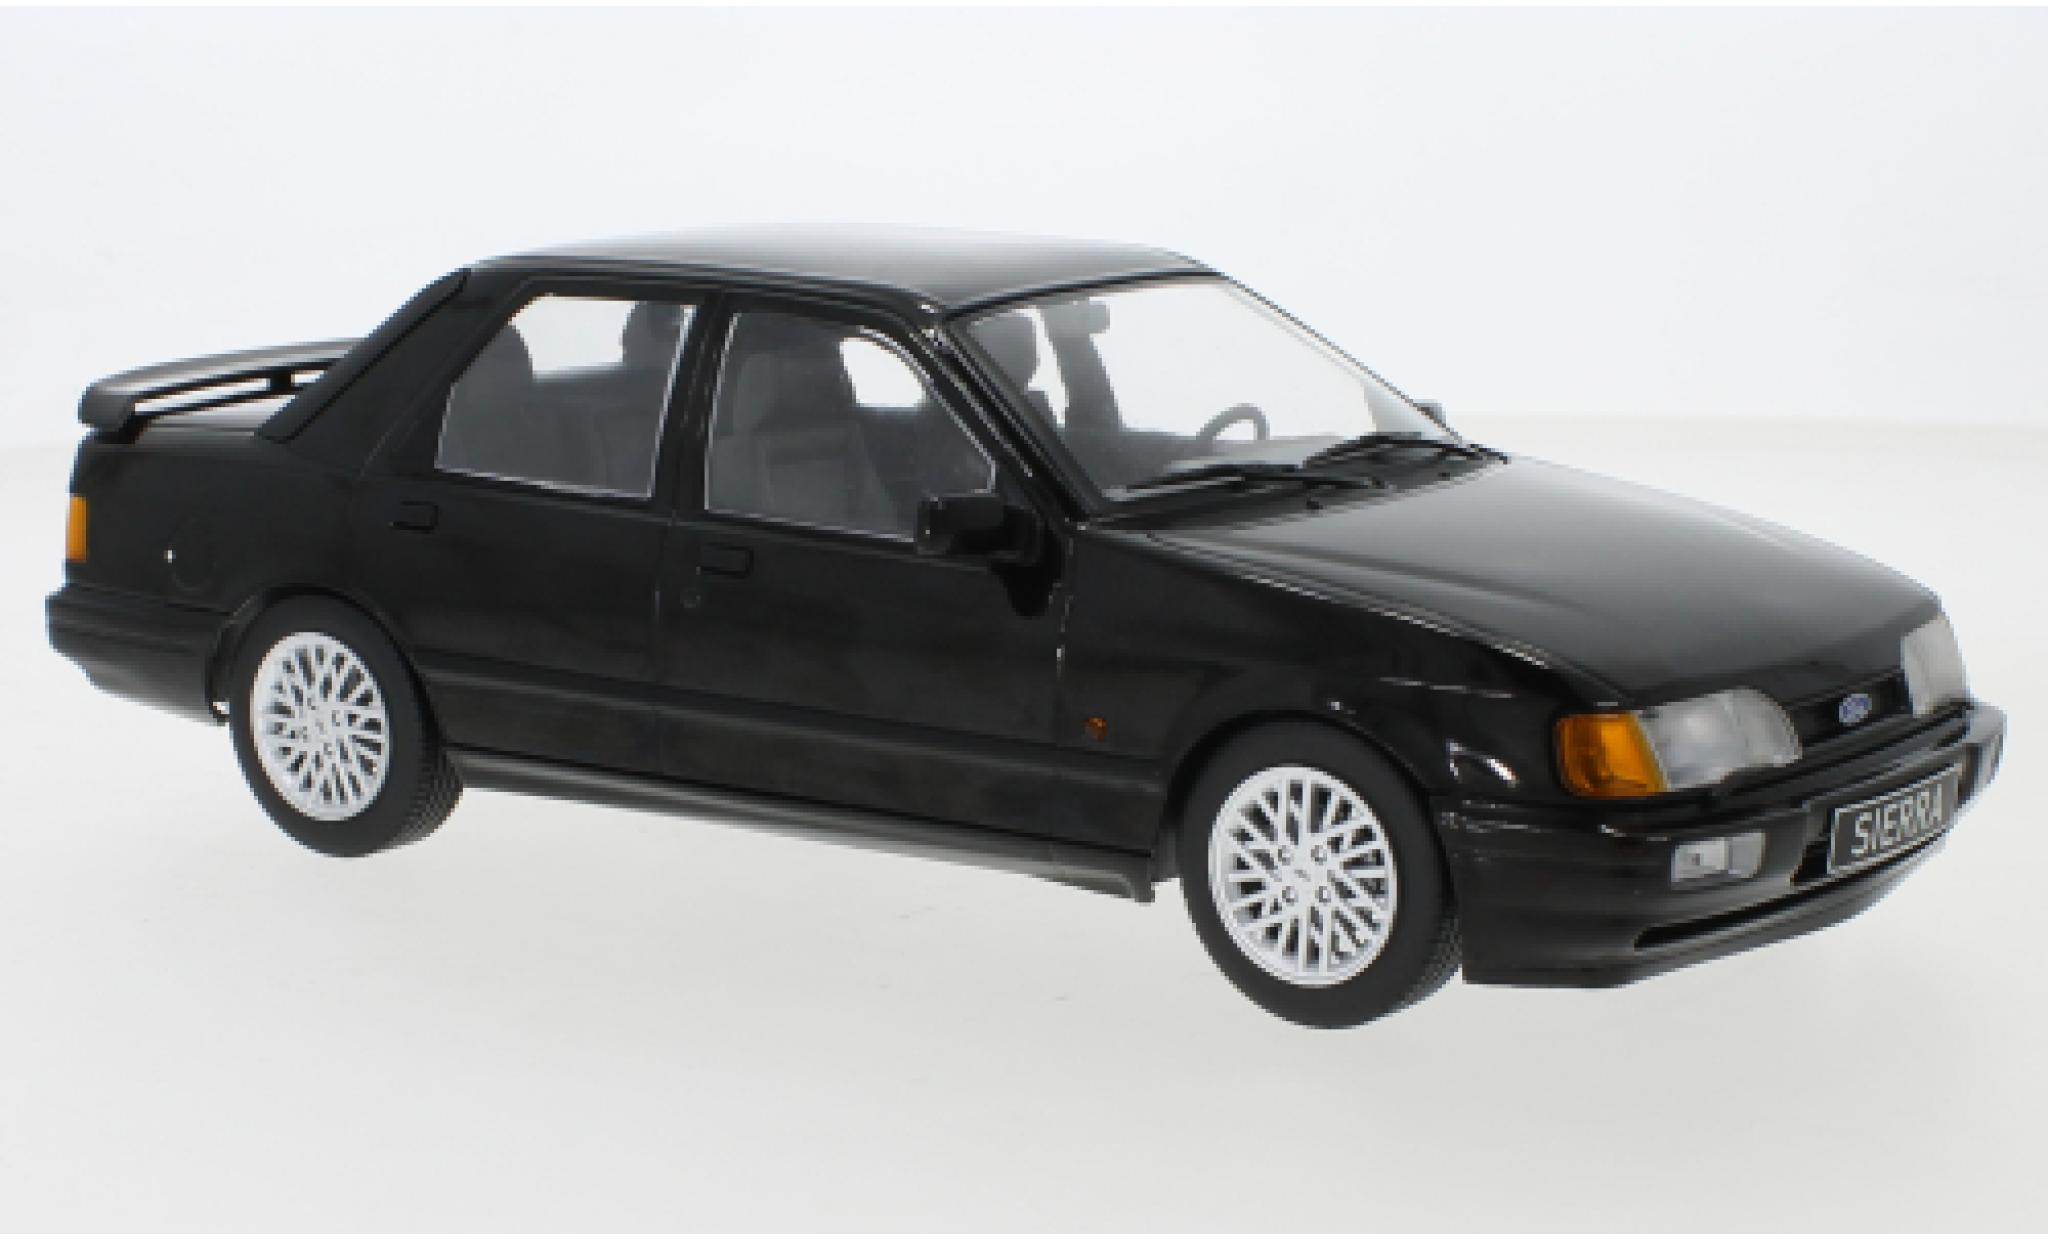 Ford Sierra 1/18 MCG Cosworth noire 1988